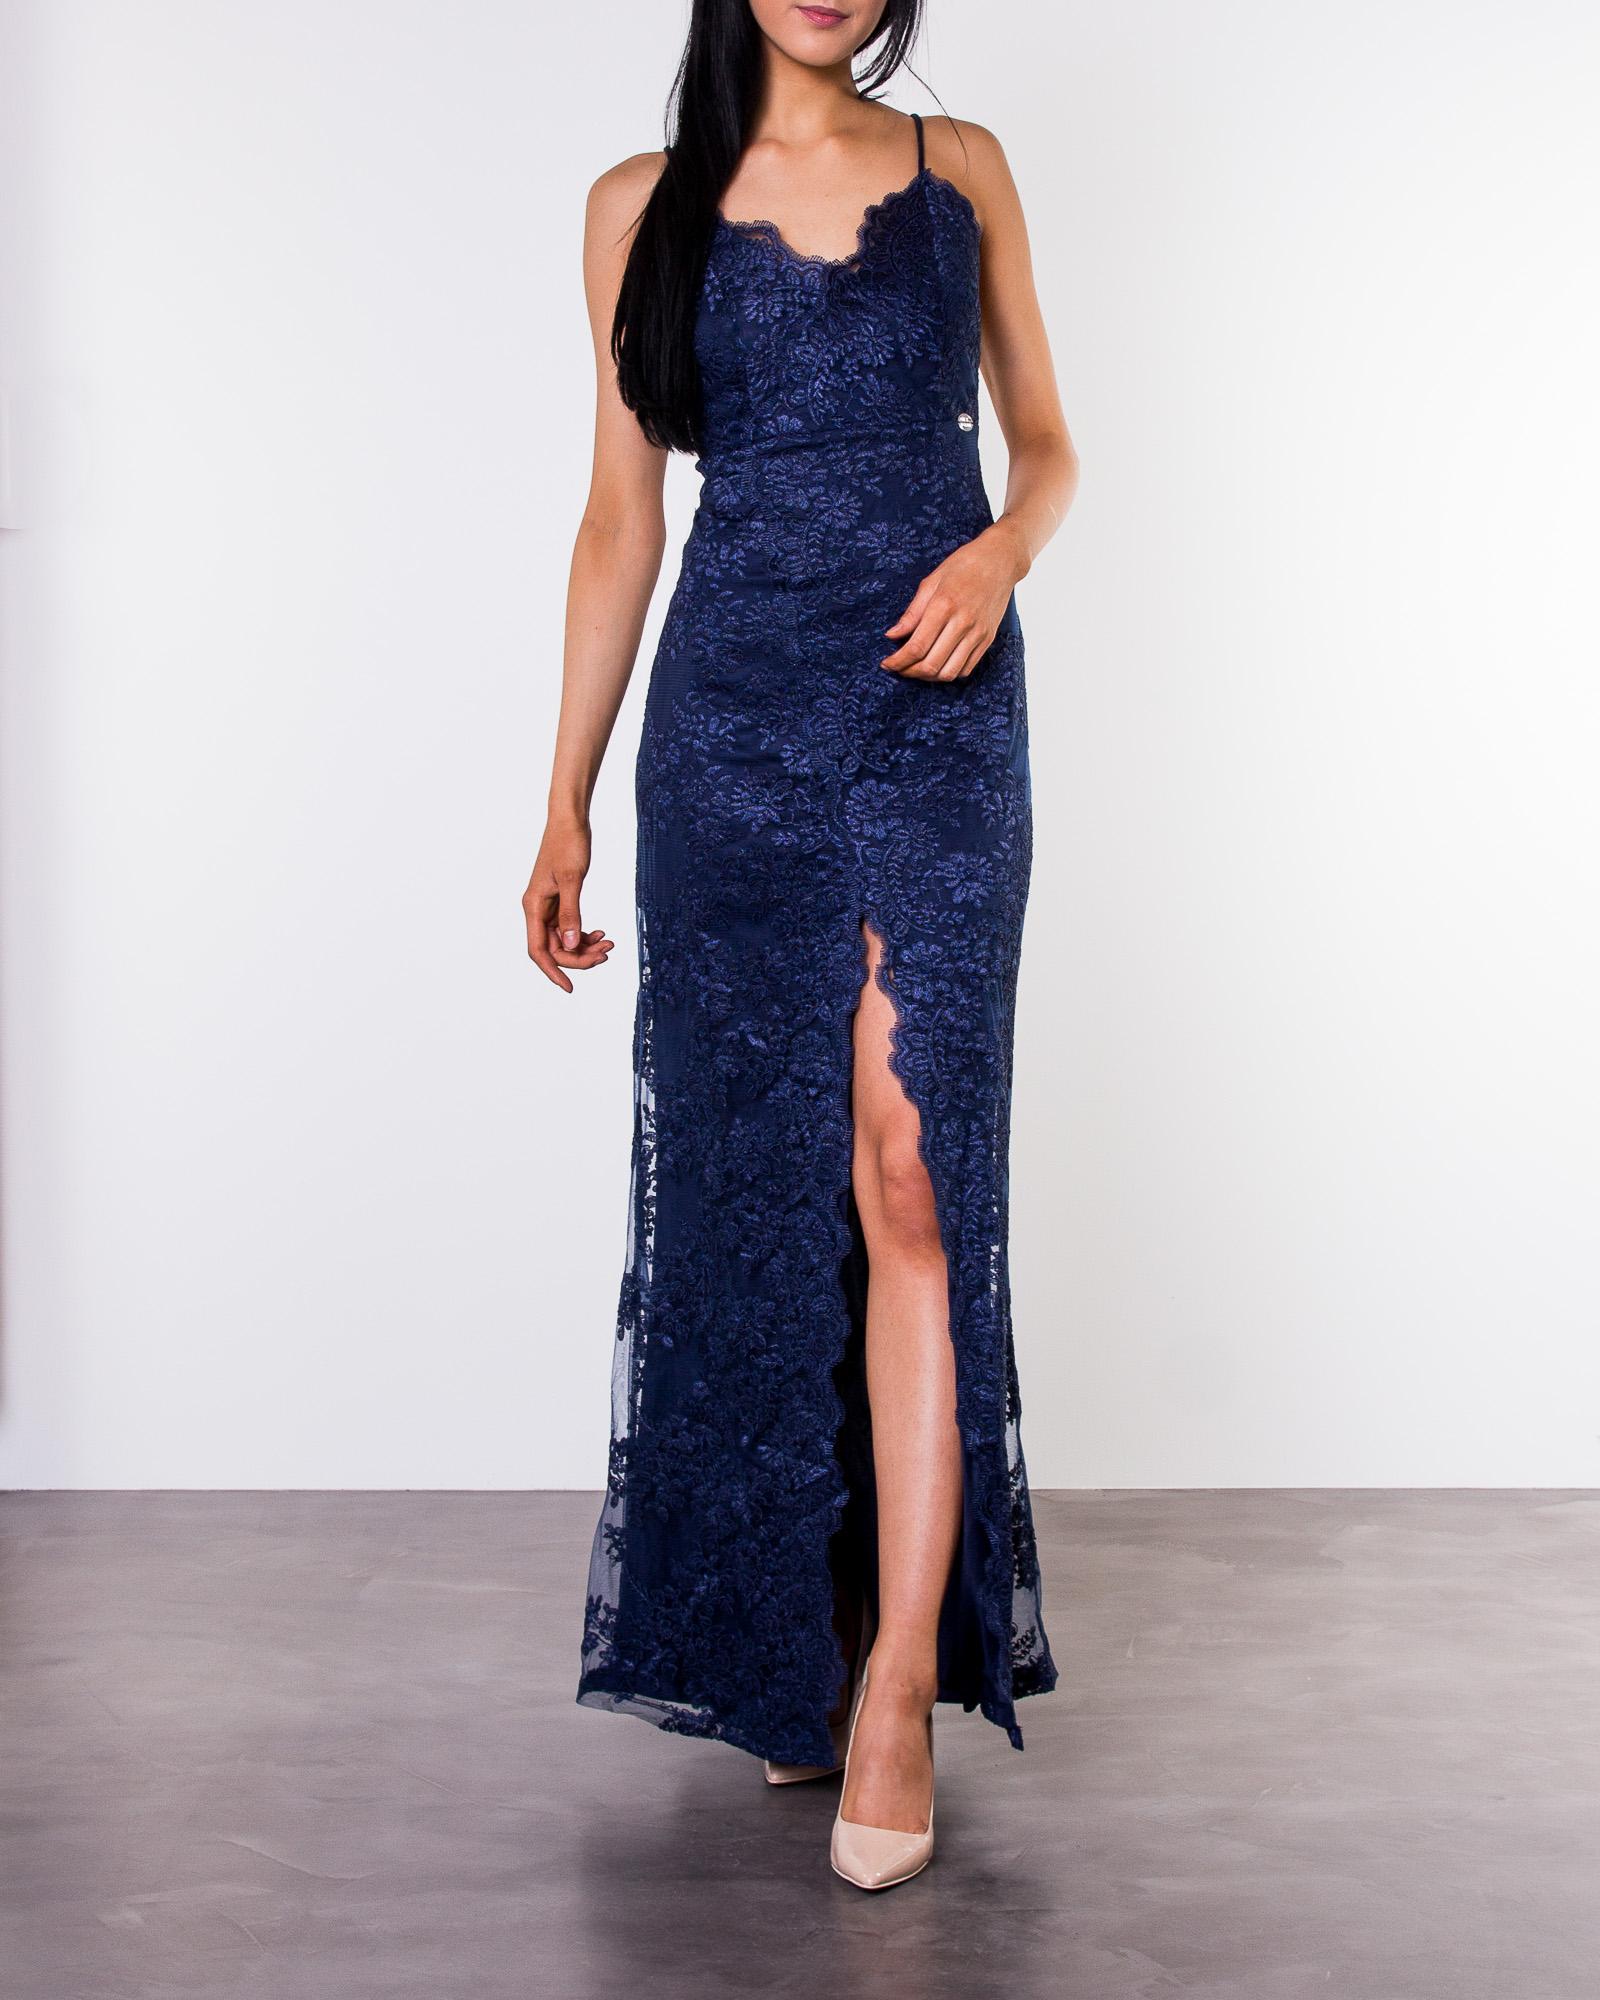 551c9b8abaed Irmeline Gown Dark Blue